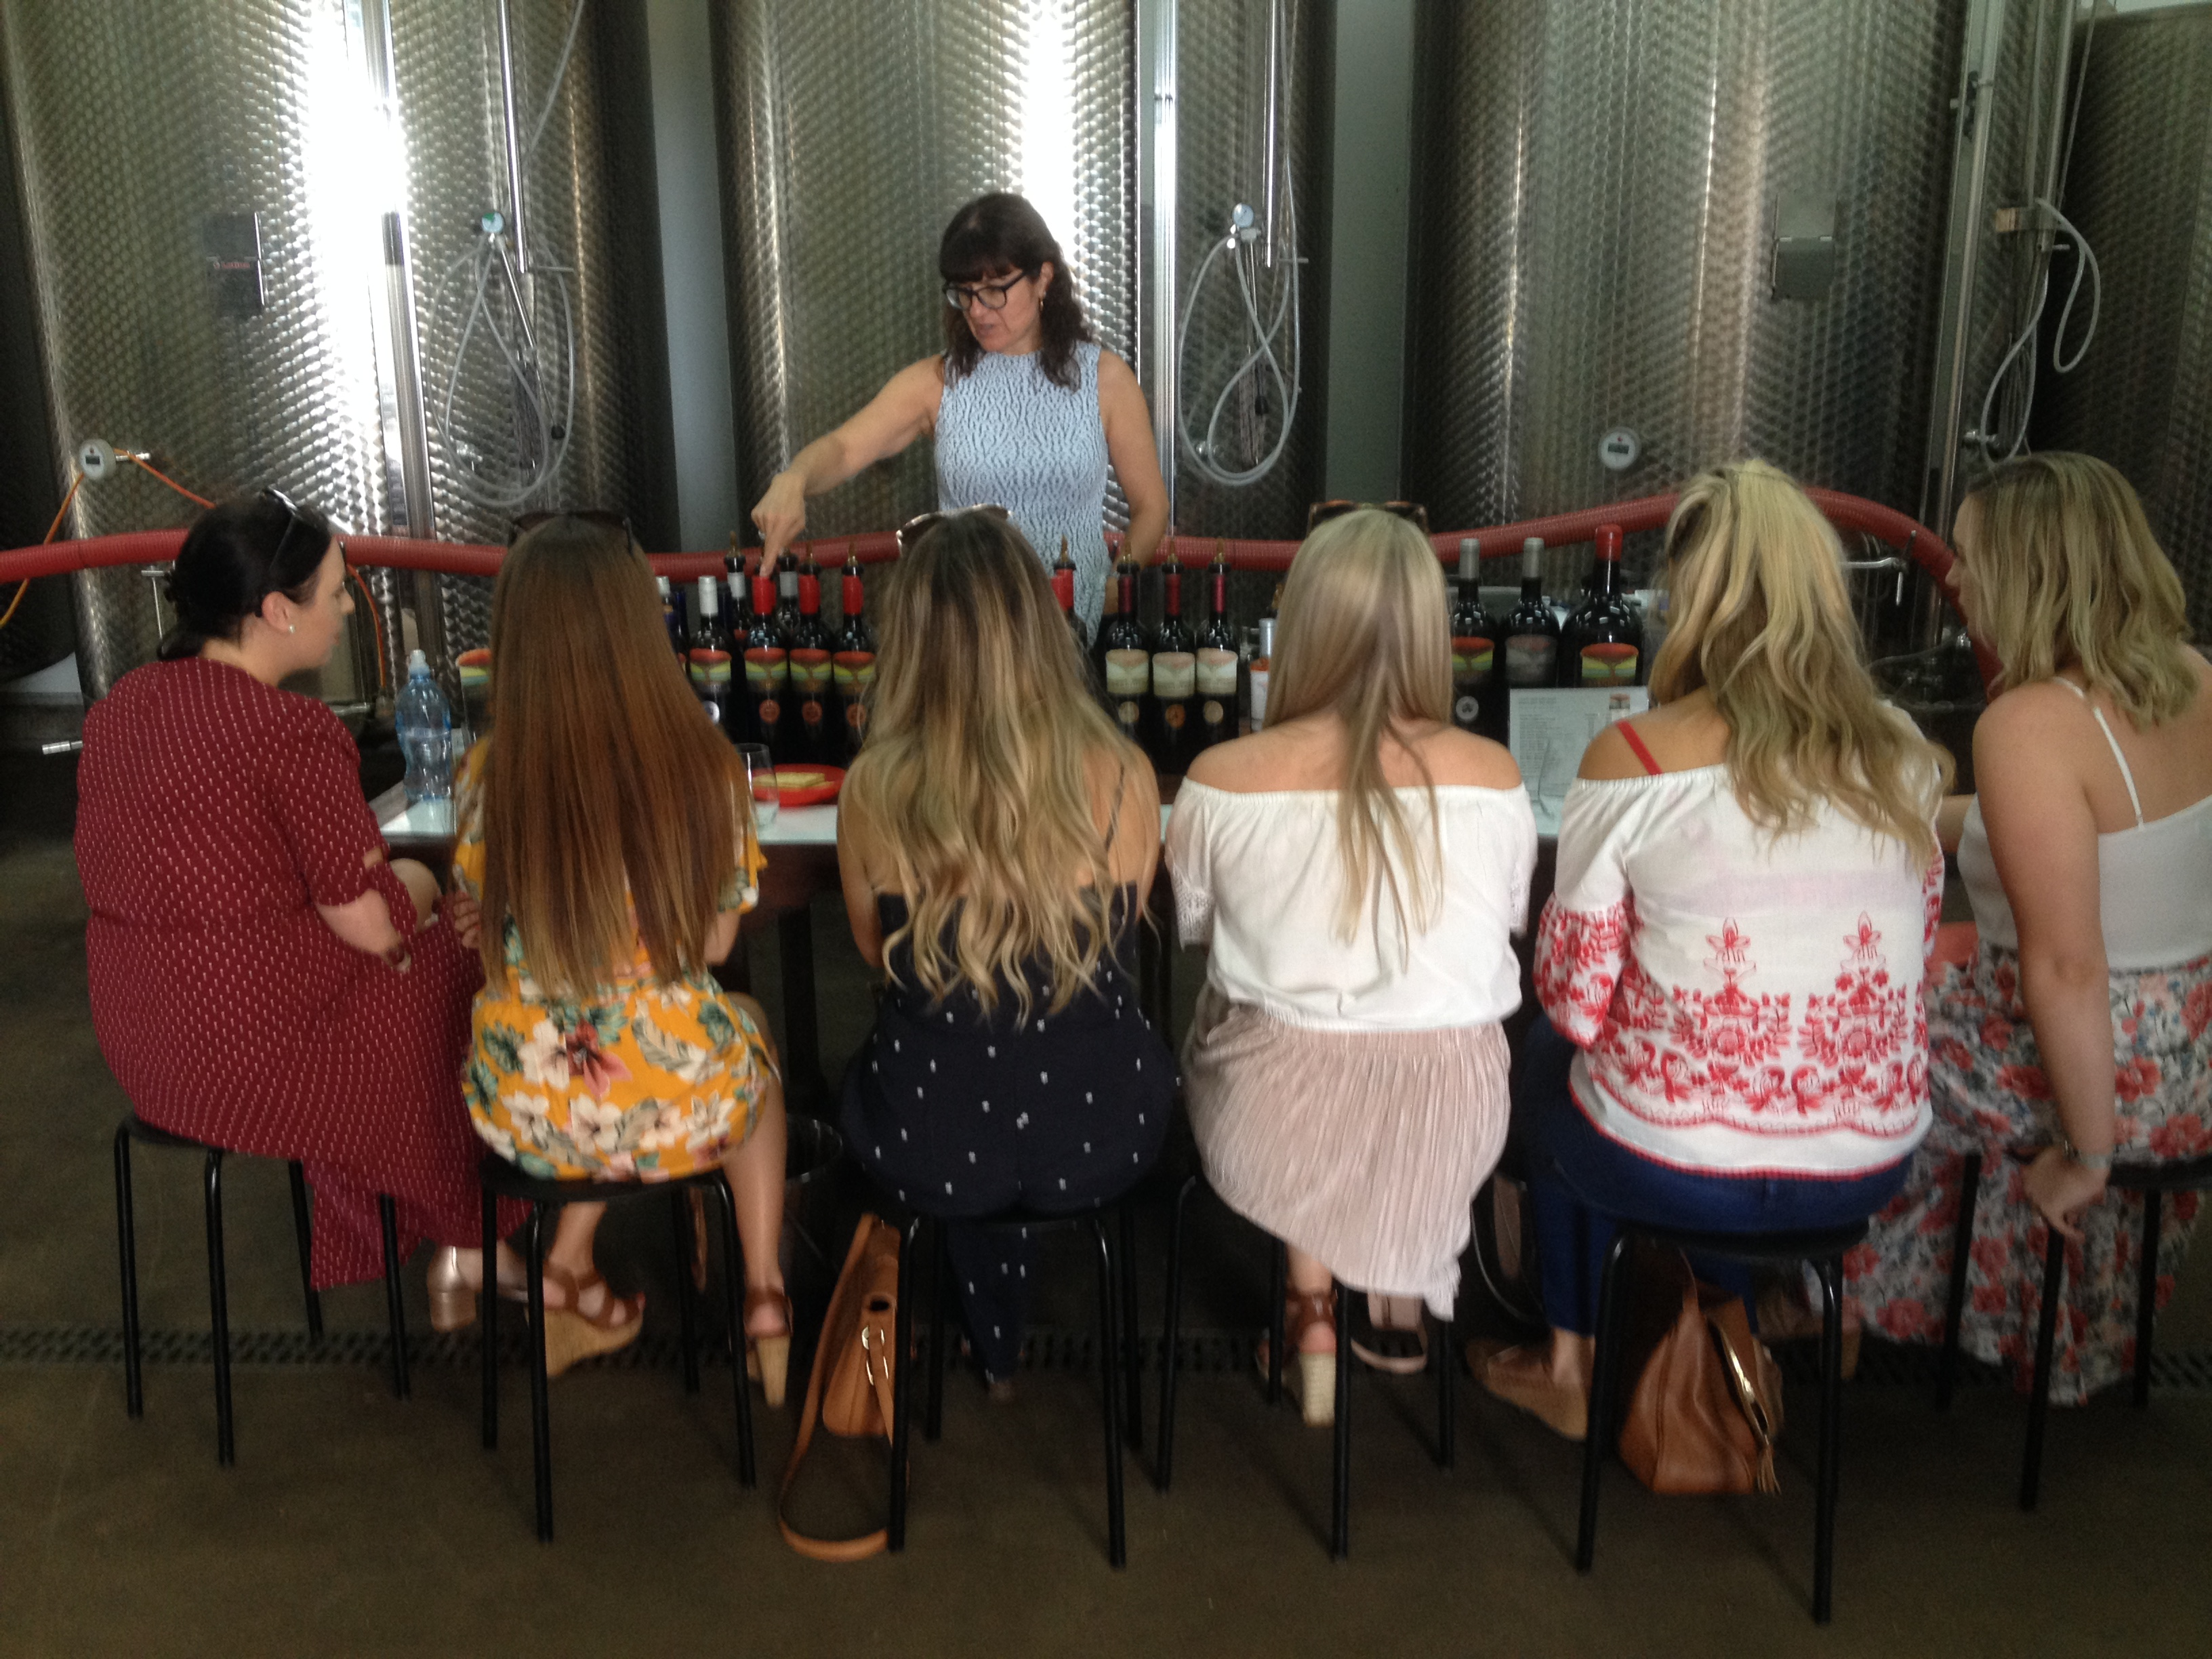 Carpe Diem Vineyards